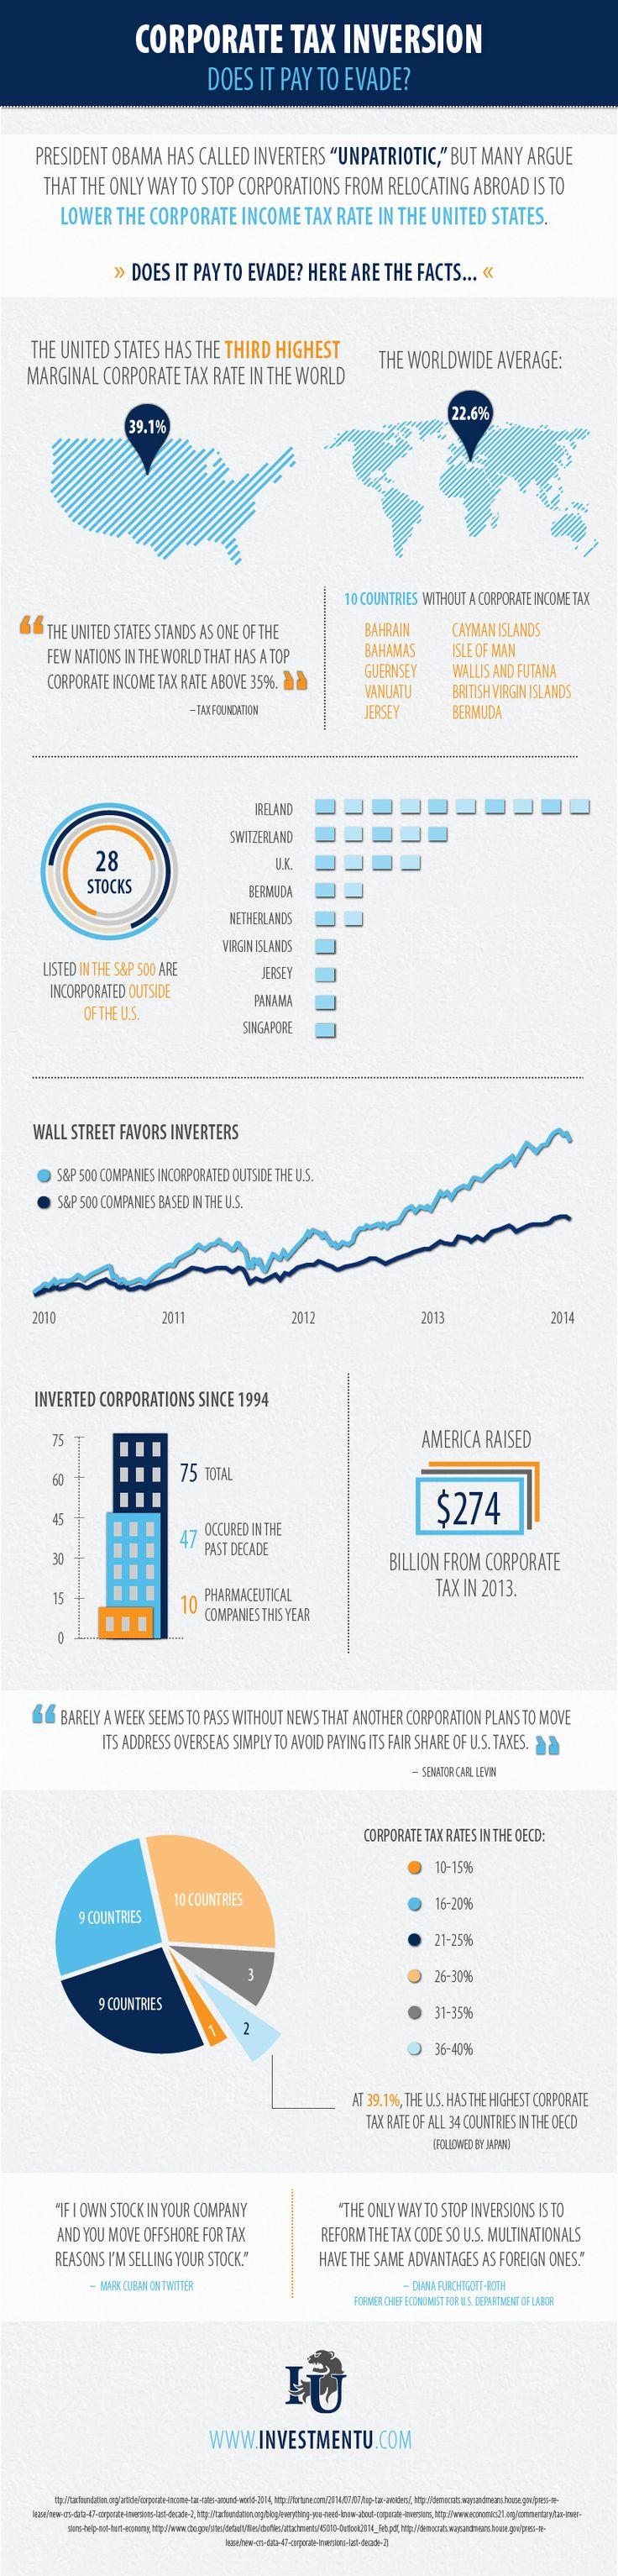 10 High-Yielding Small Cap Stocks Under $15 — Investment U